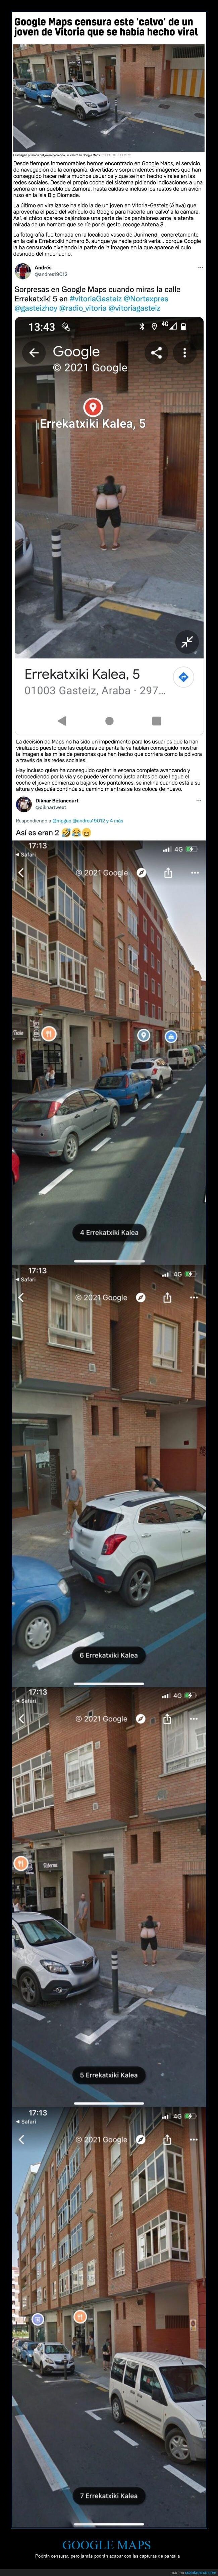 calvo,censura,google maps